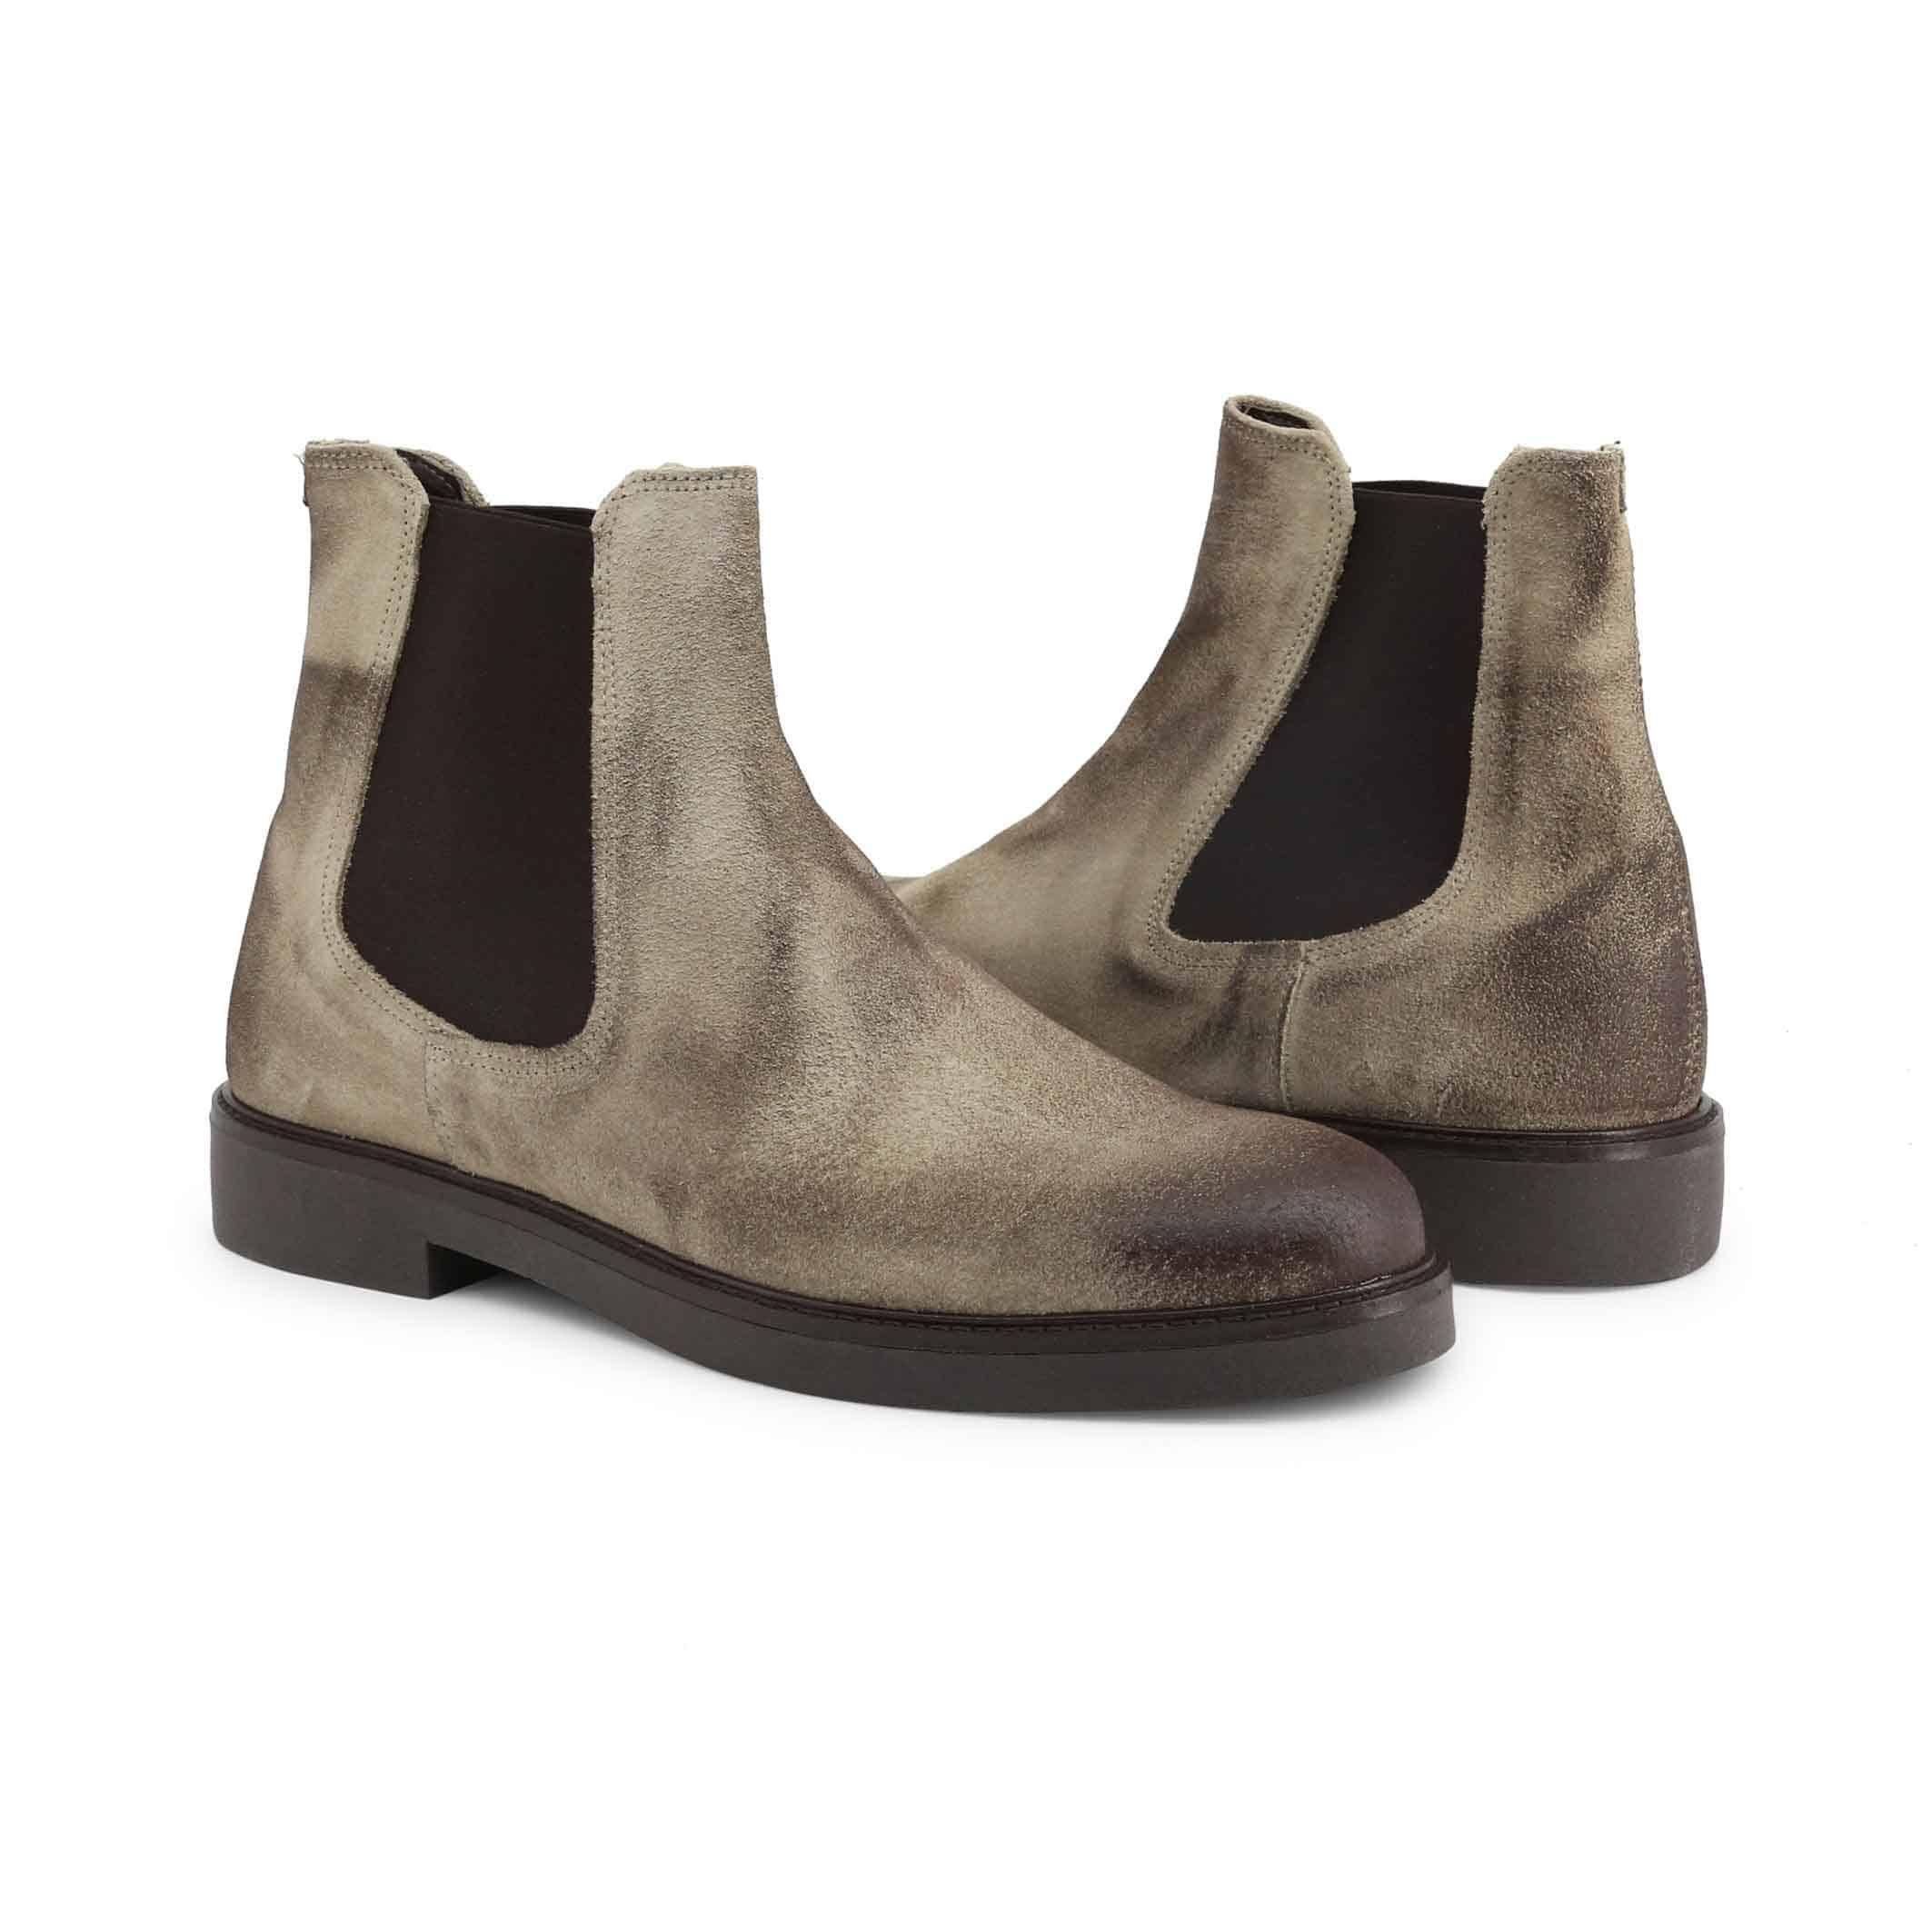 Schuhe Guido Bassi – 7081_CAMOSCIO – Braun